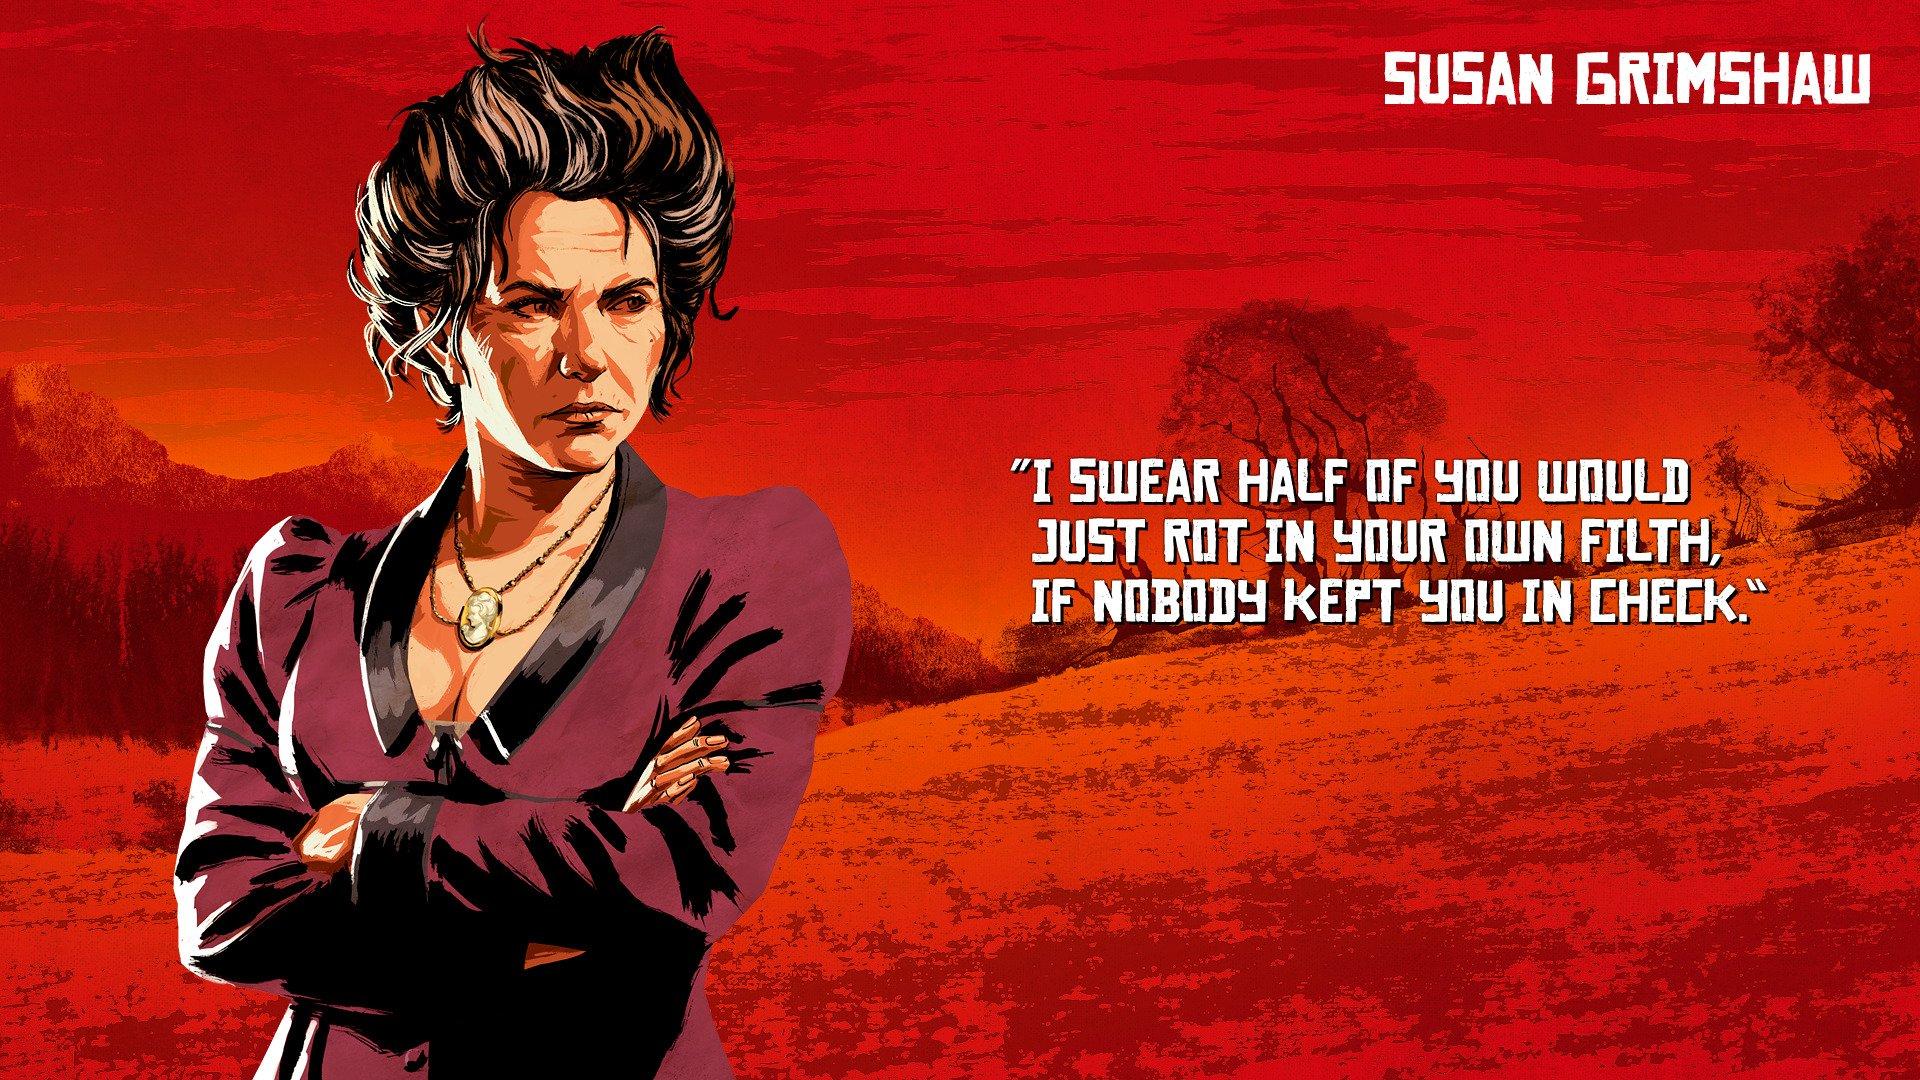 Rockstar Games revela artes dos personagens de Red Dead Redemption 2; veja 14